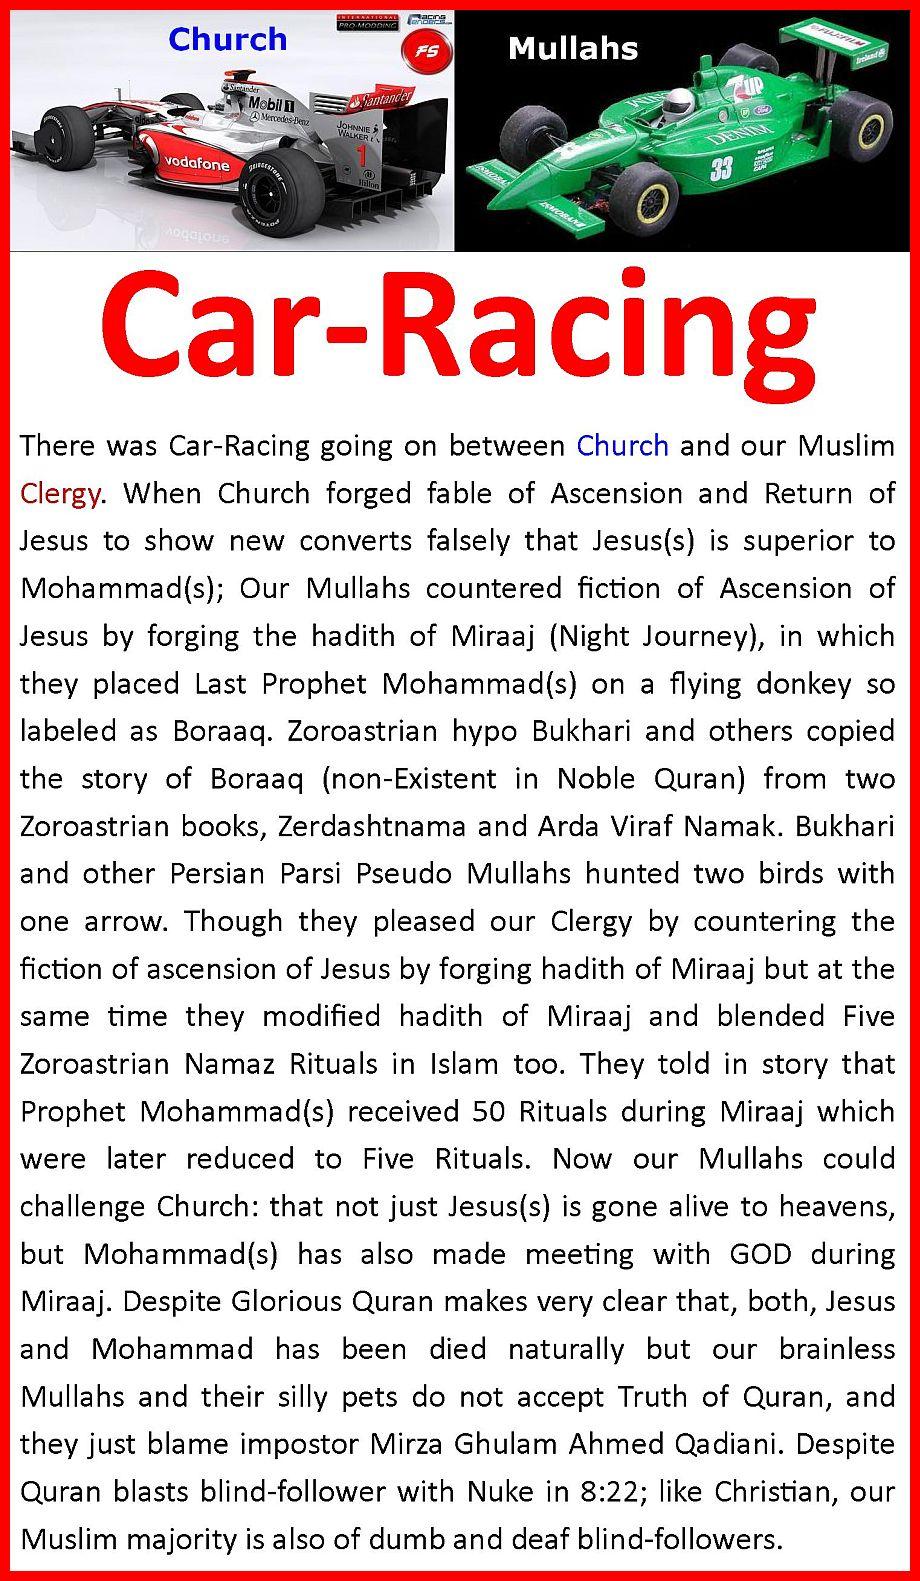 CarRacingChurchVsMullahsF